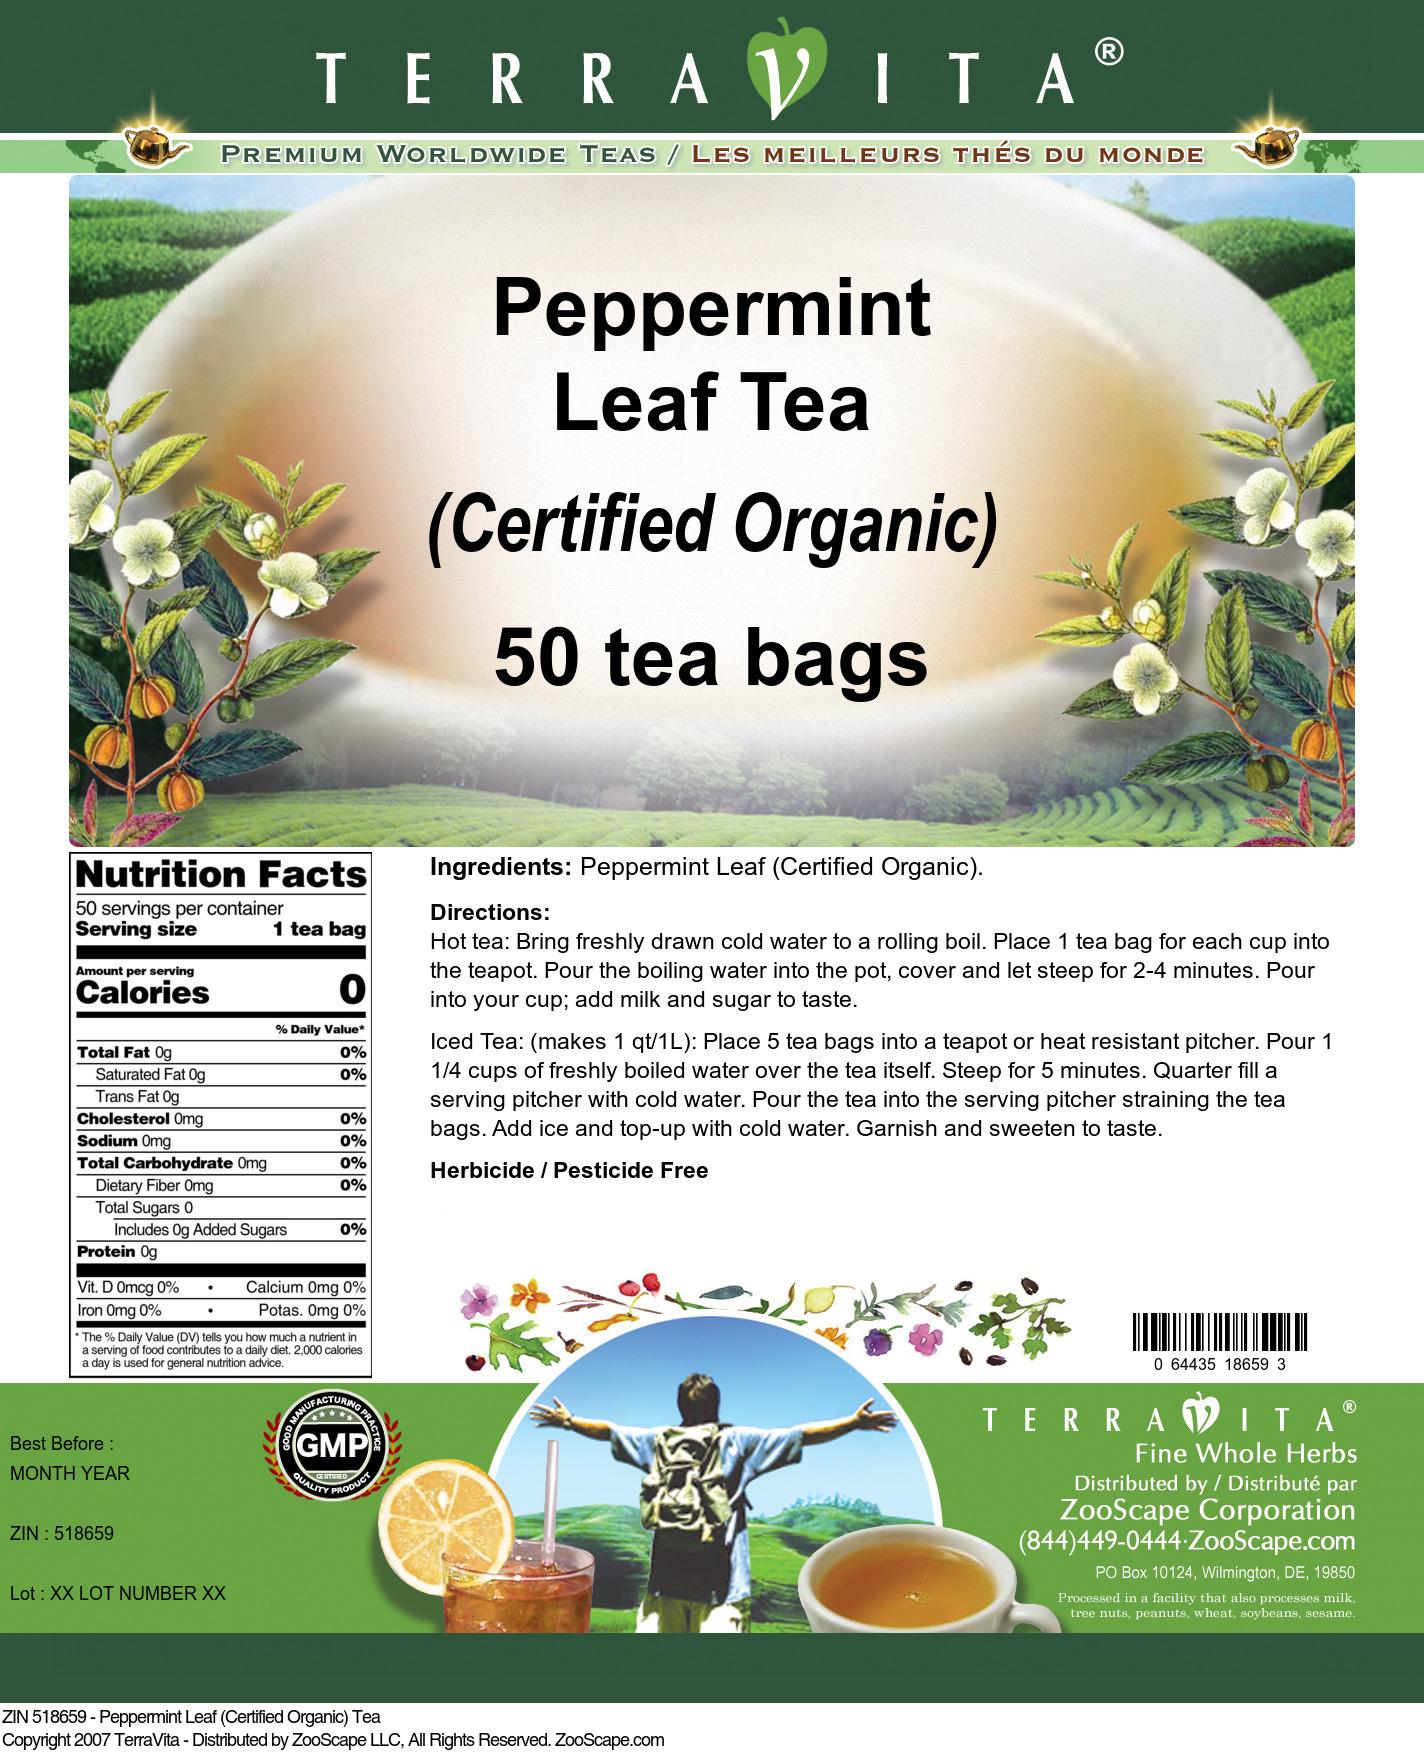 Peppermint Leaf (Certified Organic) Tea